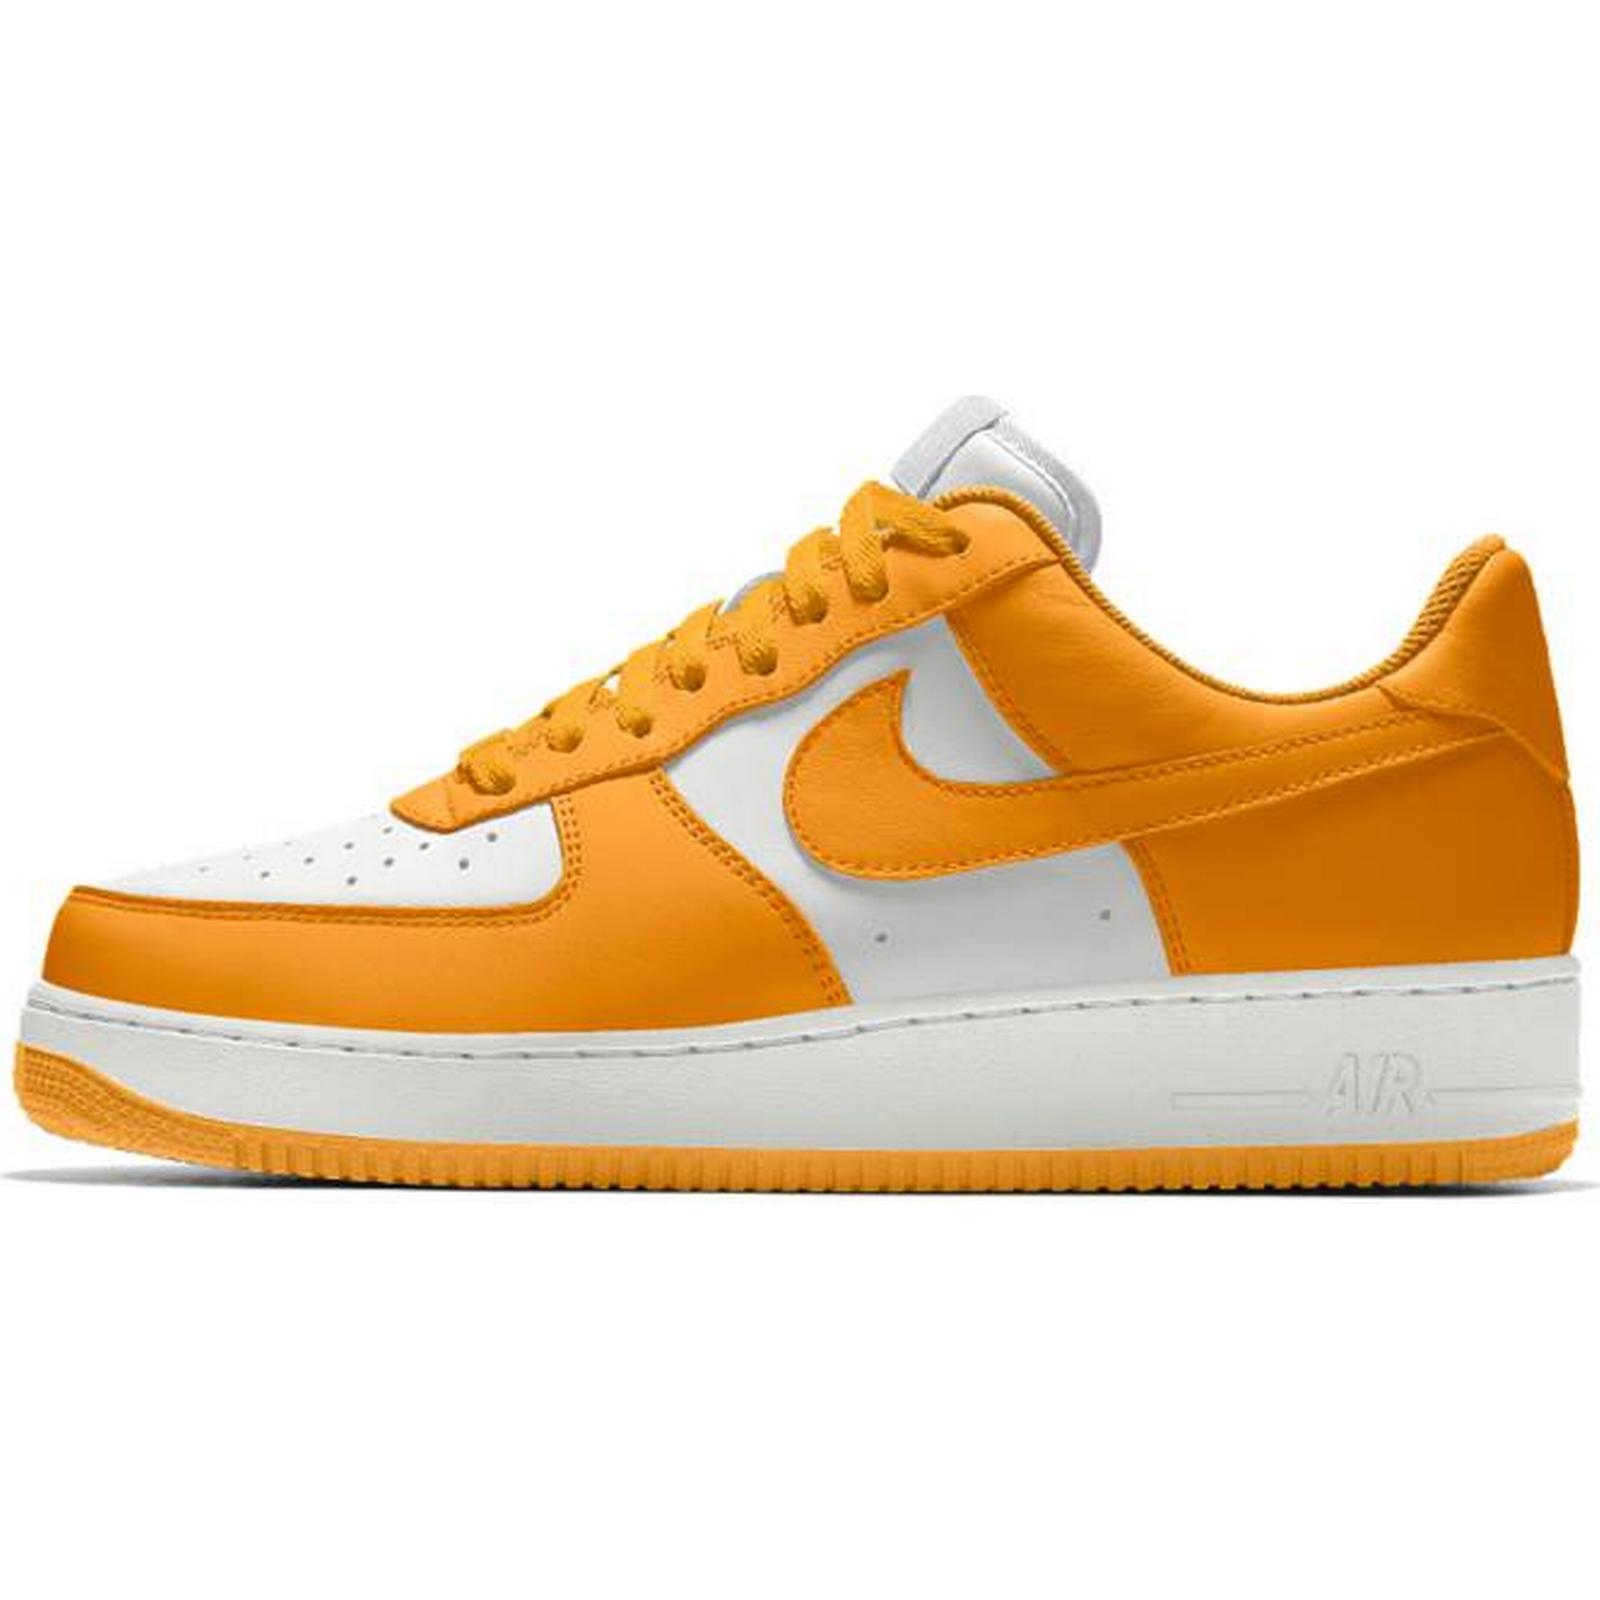 Man/Woman : NIKE Buty Dla Dużych Dzieci Nike ID Air Force 1 Low ID Nike : recommended today 6a92c5